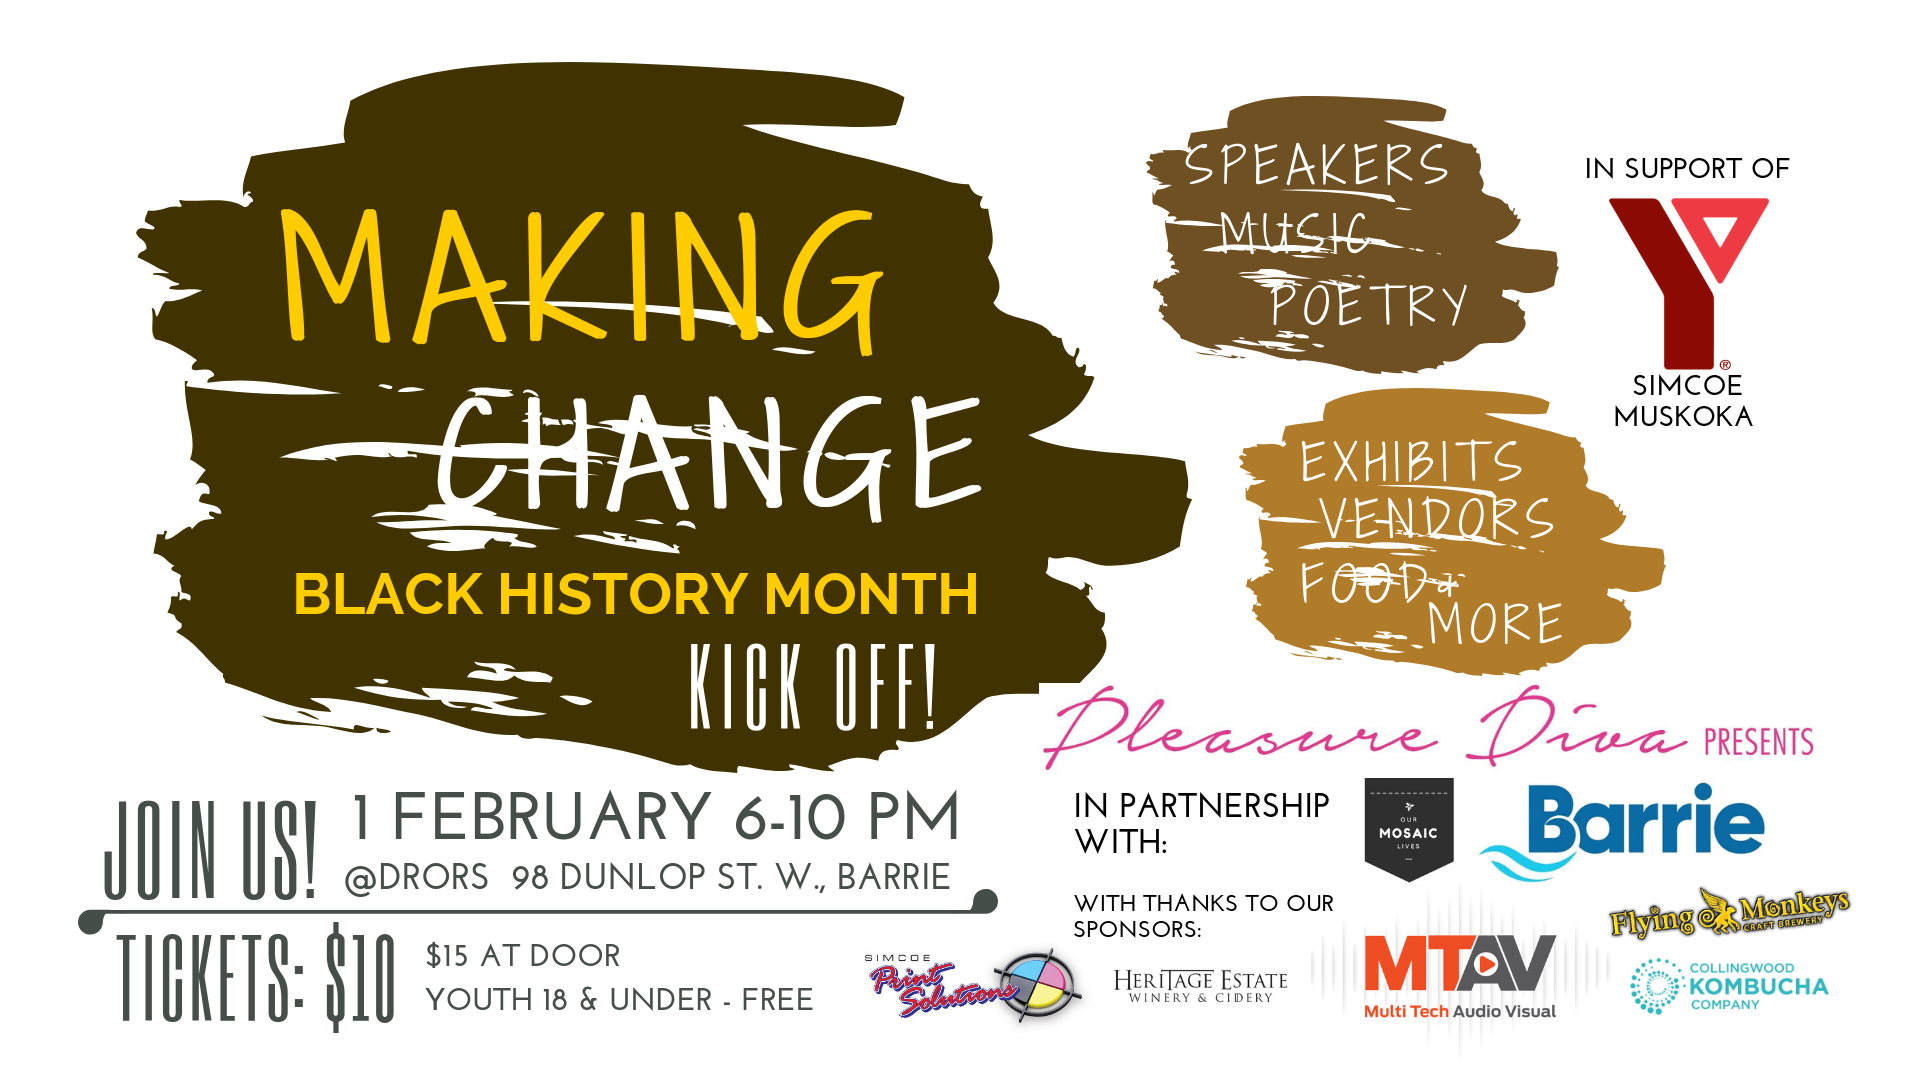 Making Change - Black History Month Kick